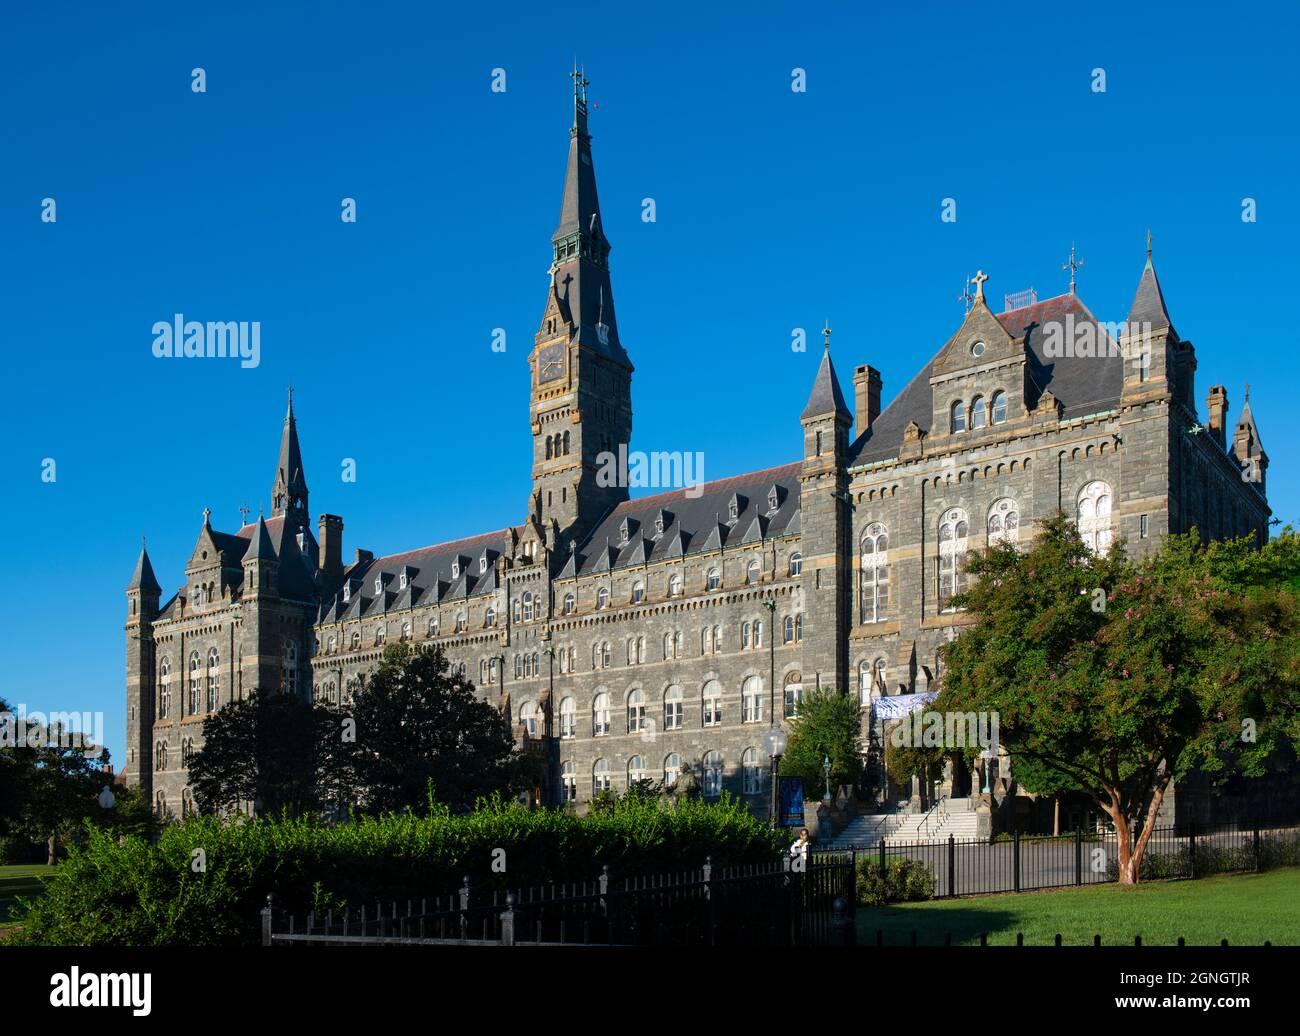 usa-washington-dc-georgetown-georgetown-university-healy-hall-at-the-jesuit-catholic-school-a-national-historic-landmark-2GNGTJR.jpg